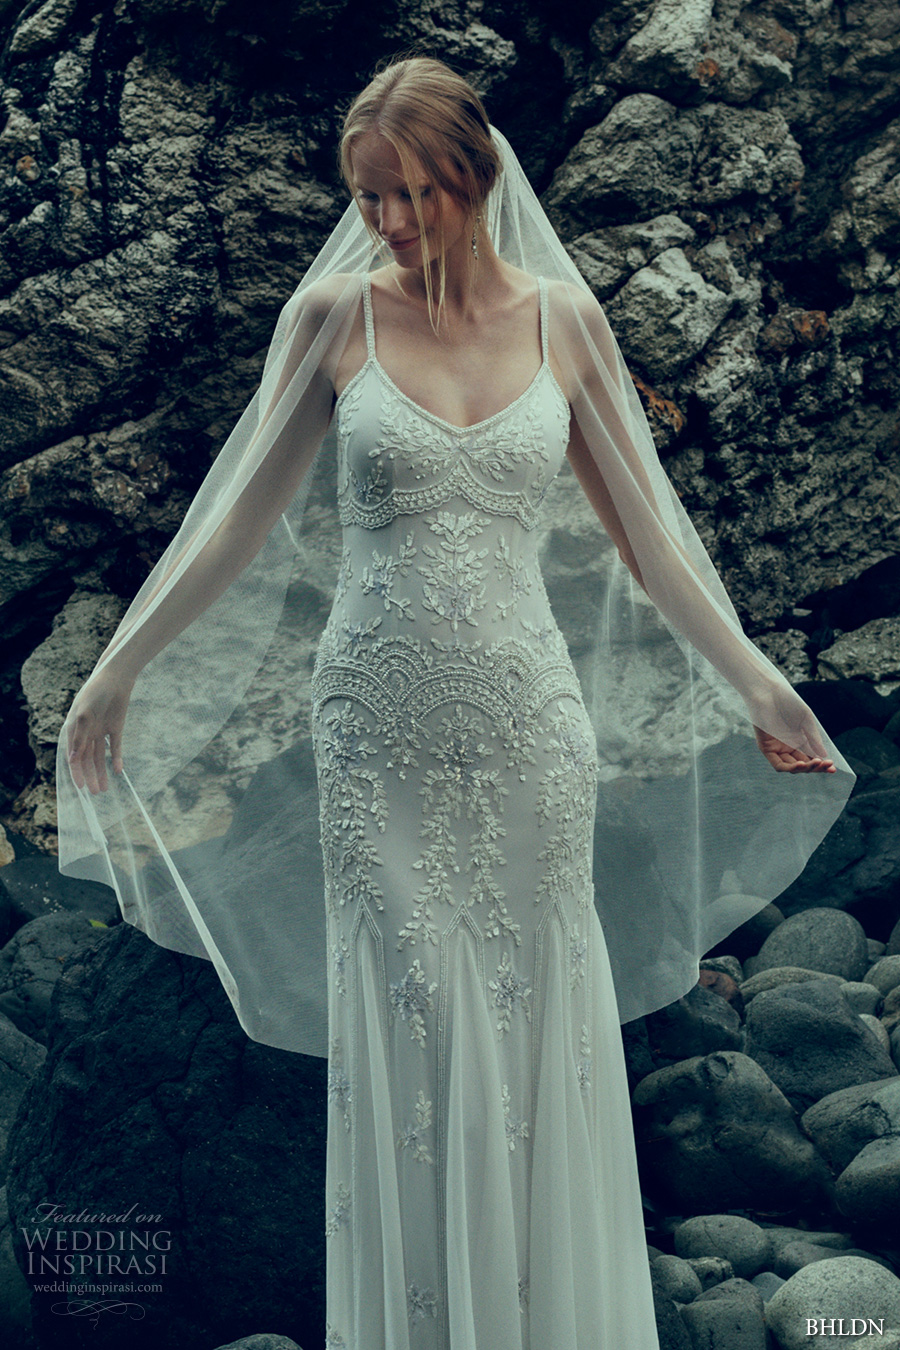 Bhldn fall 2016 wedding dresses wild serenity campaign for Wedding dresses like bhldn